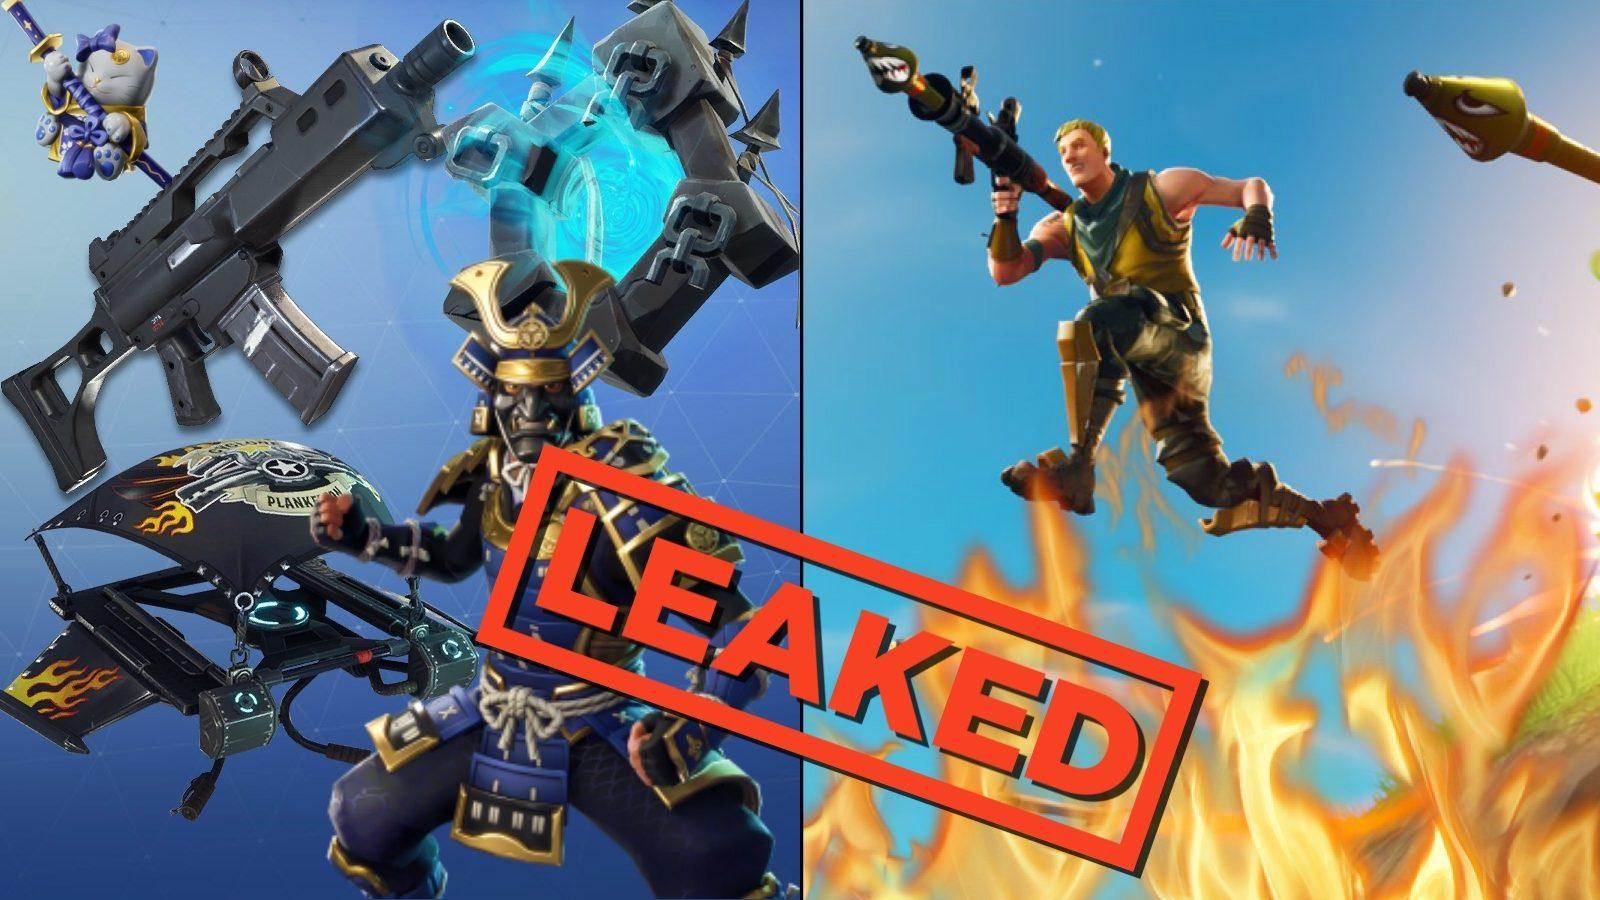 Full Roundup Of All The Fortnite Leaks And Changes From Mega Update V5 30 Dexerto Get all the fortnite leaked skins, latest leaked weapons, new season challenges & leaked map details. mega update v5 30